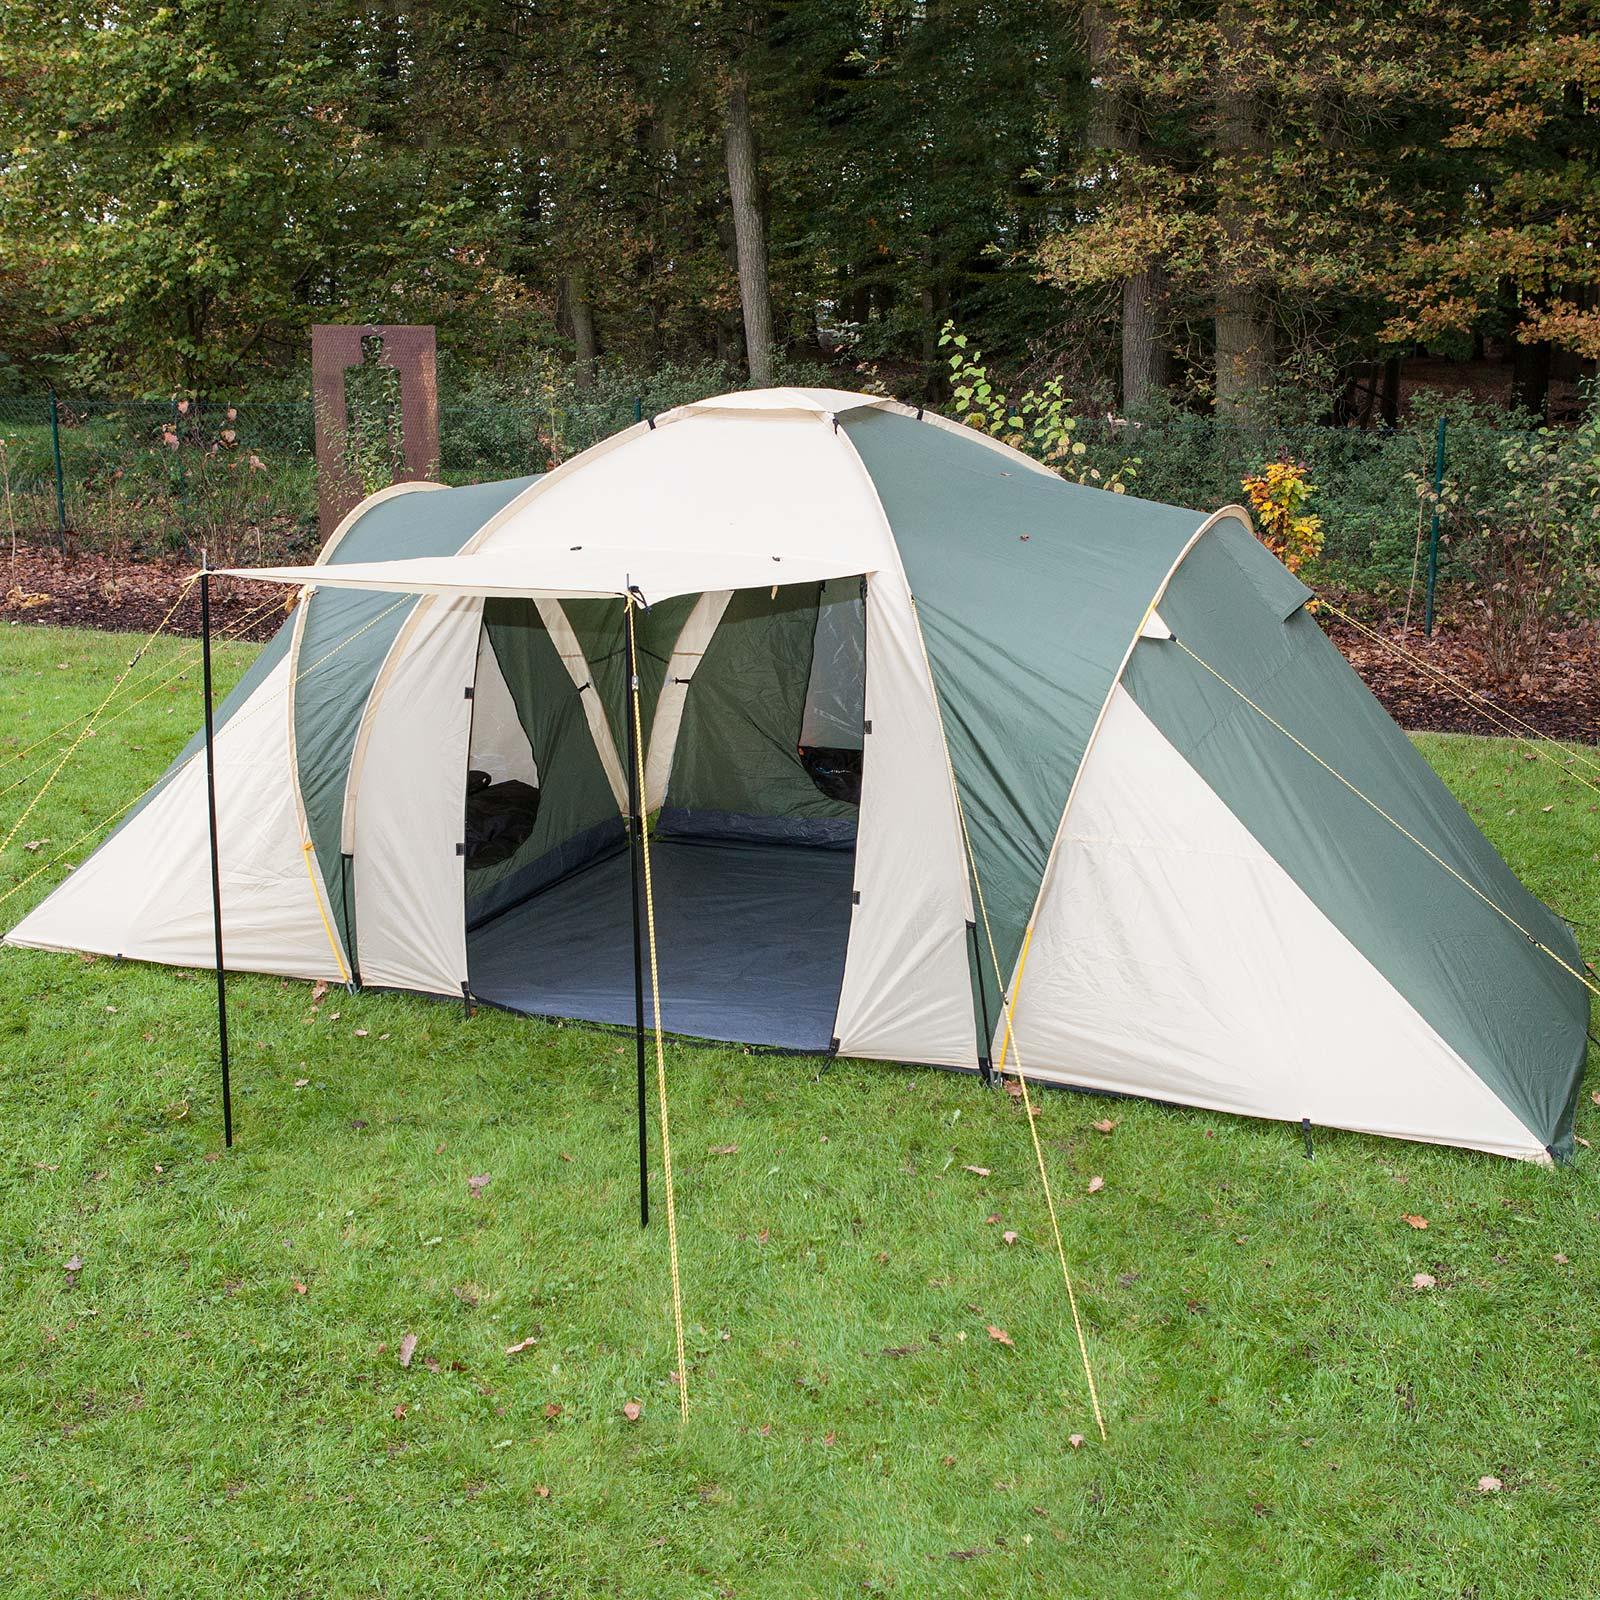 skandika daytona silverstone family group dome tents 6 9 person man new. Black Bedroom Furniture Sets. Home Design Ideas